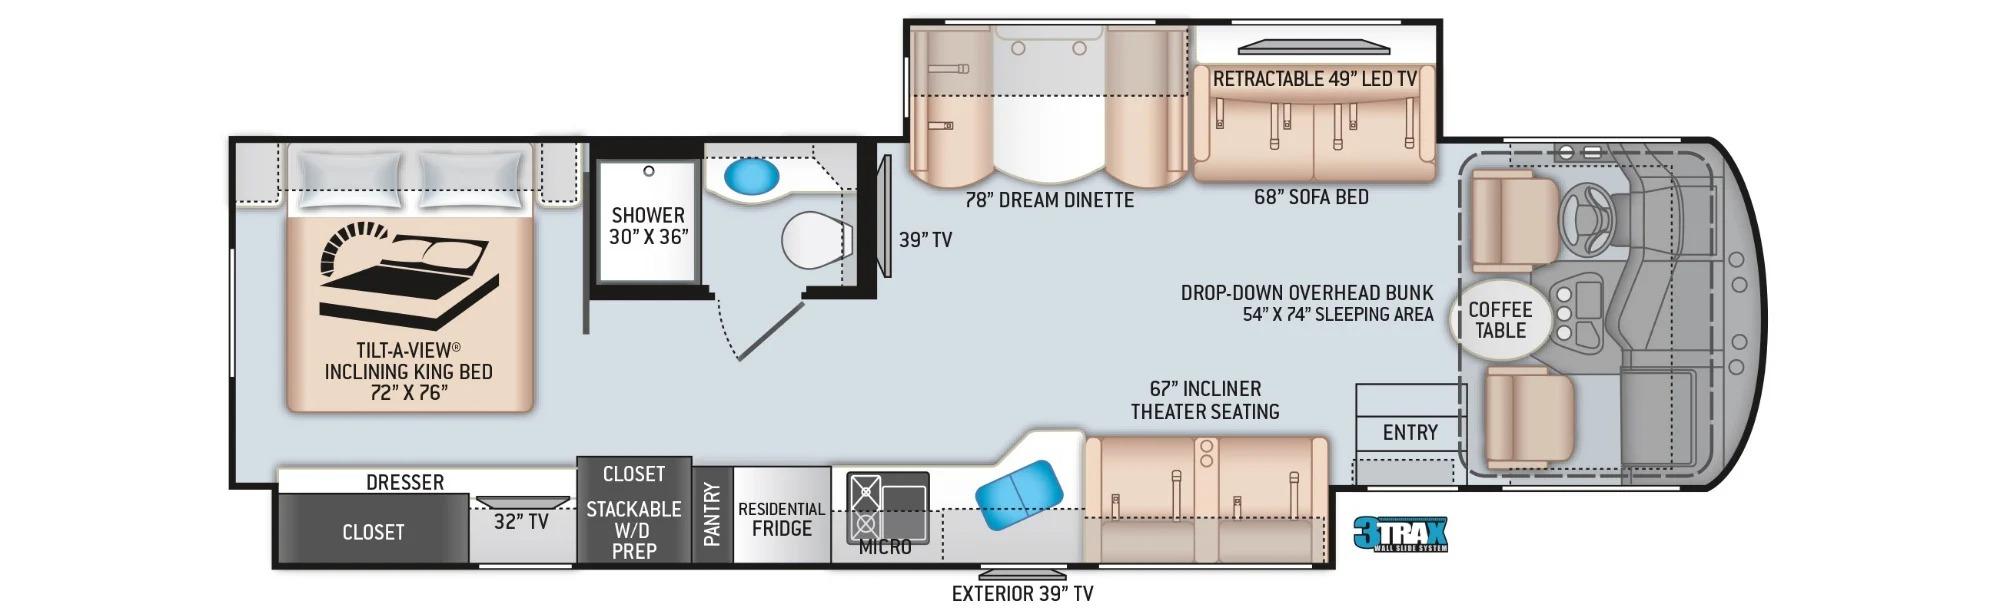 View Floor Plan for 2022 THOR MIRAMAR 35.2